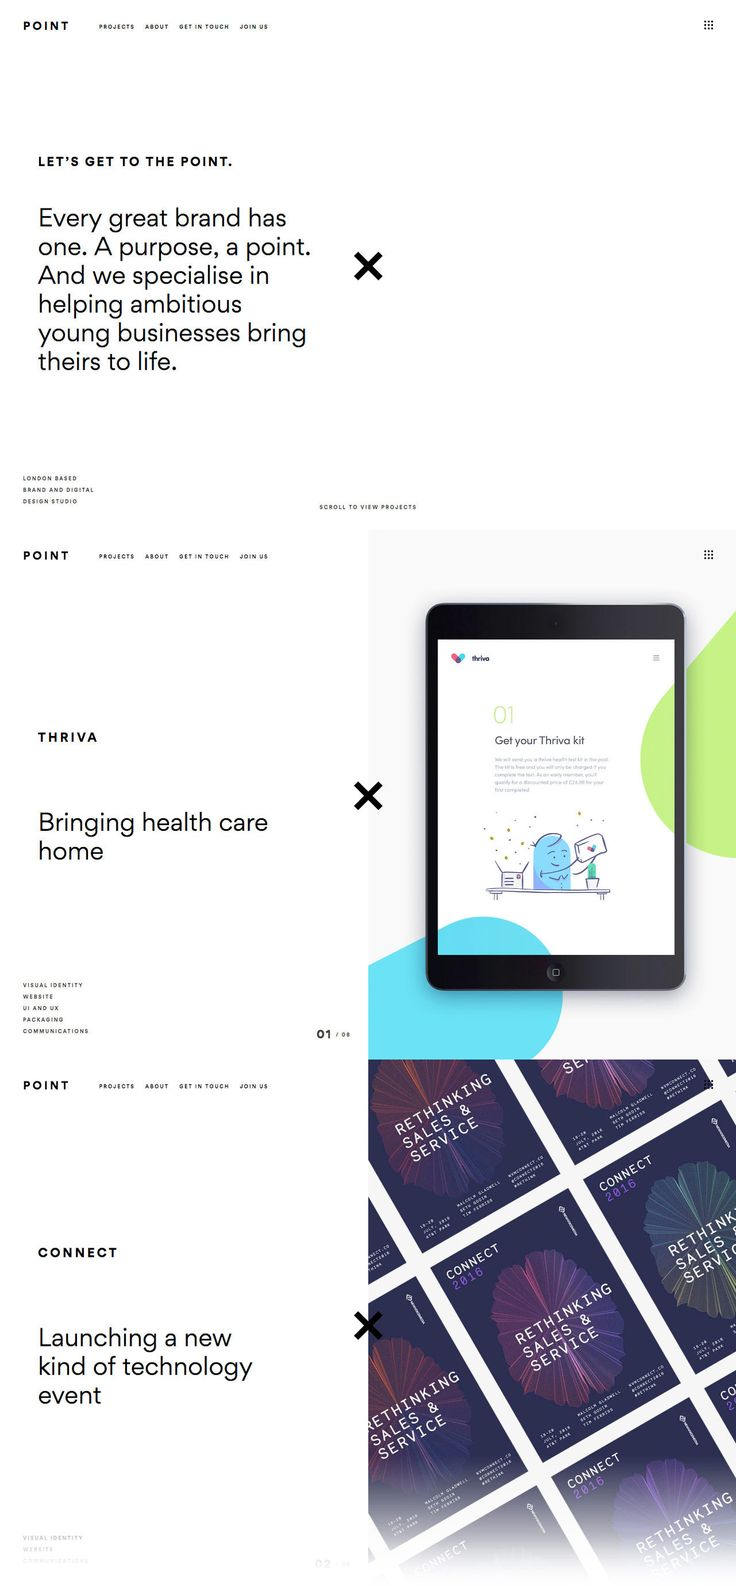 Point (More web design inspiration at topdesigninspiration.com) #design #web #webdesign #sitedesign #responsive #ux #ui